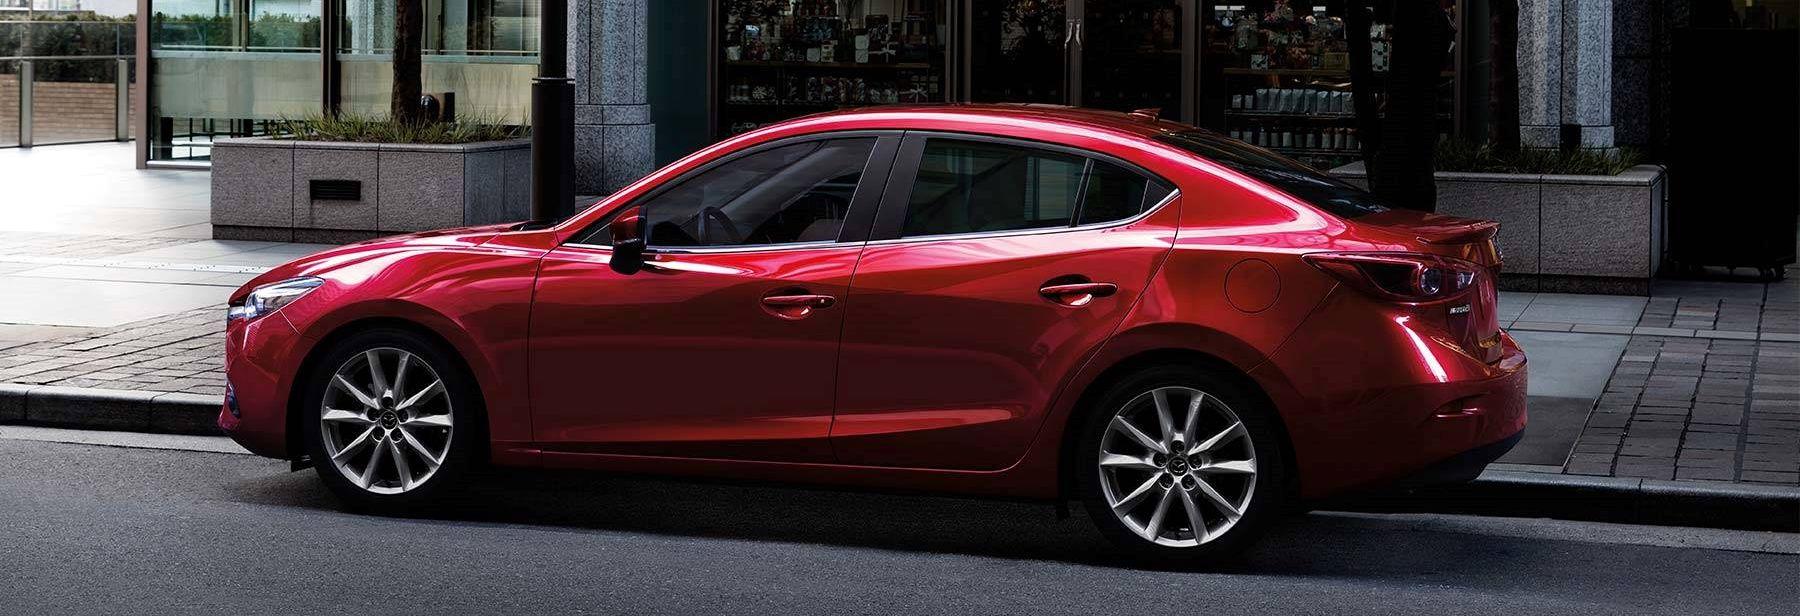 2018 Mazda3 for Sale near North Bethesda, MD